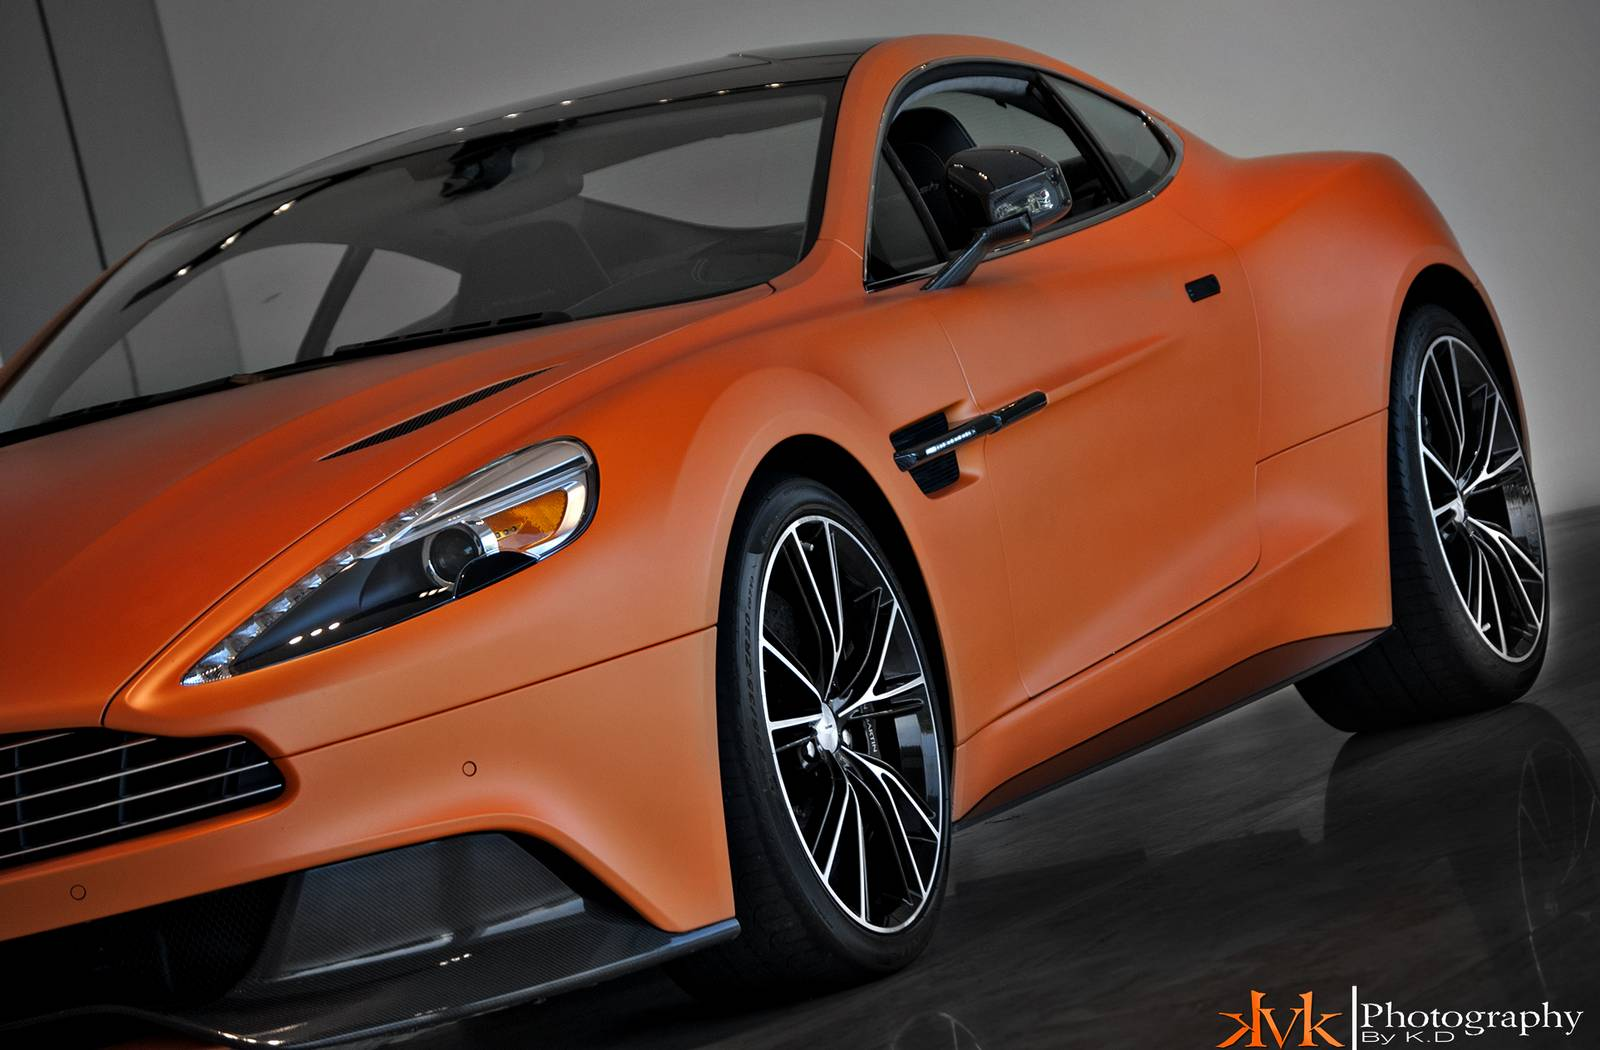 Gallery: Matte Orange 2014 Aston Martin Vanquish by kVk ...